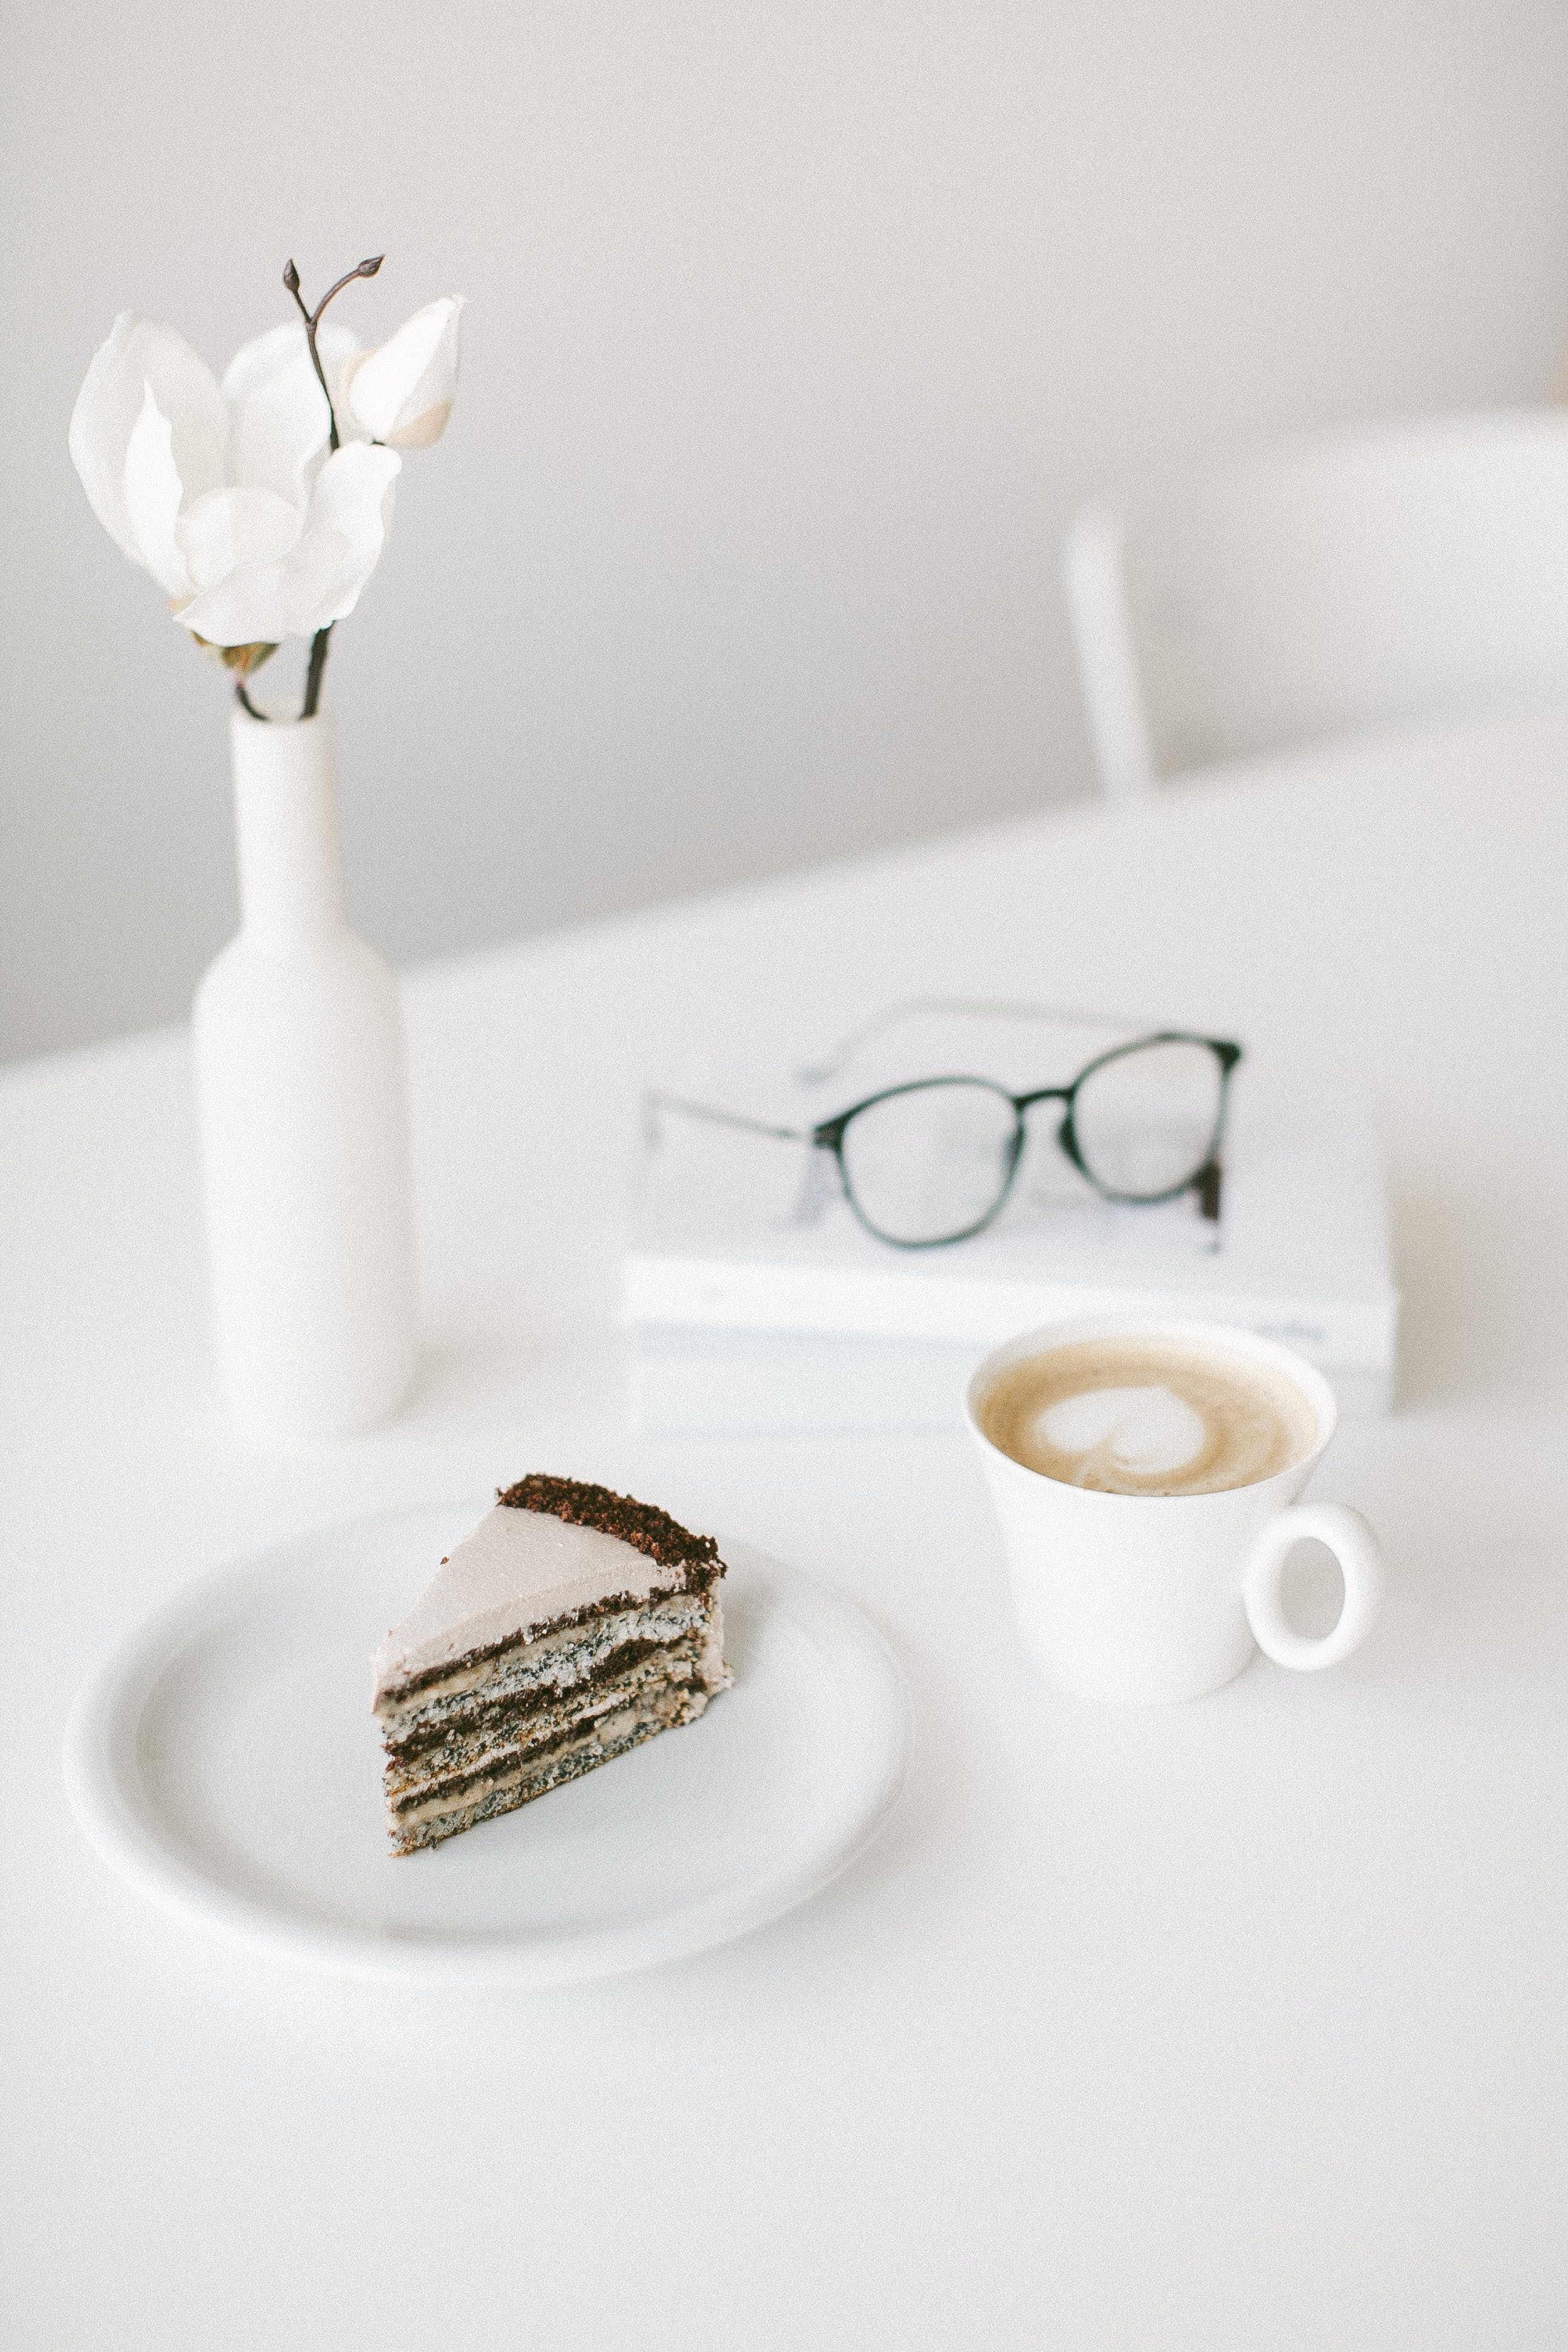 Close-Up Photo of Slice of Cake